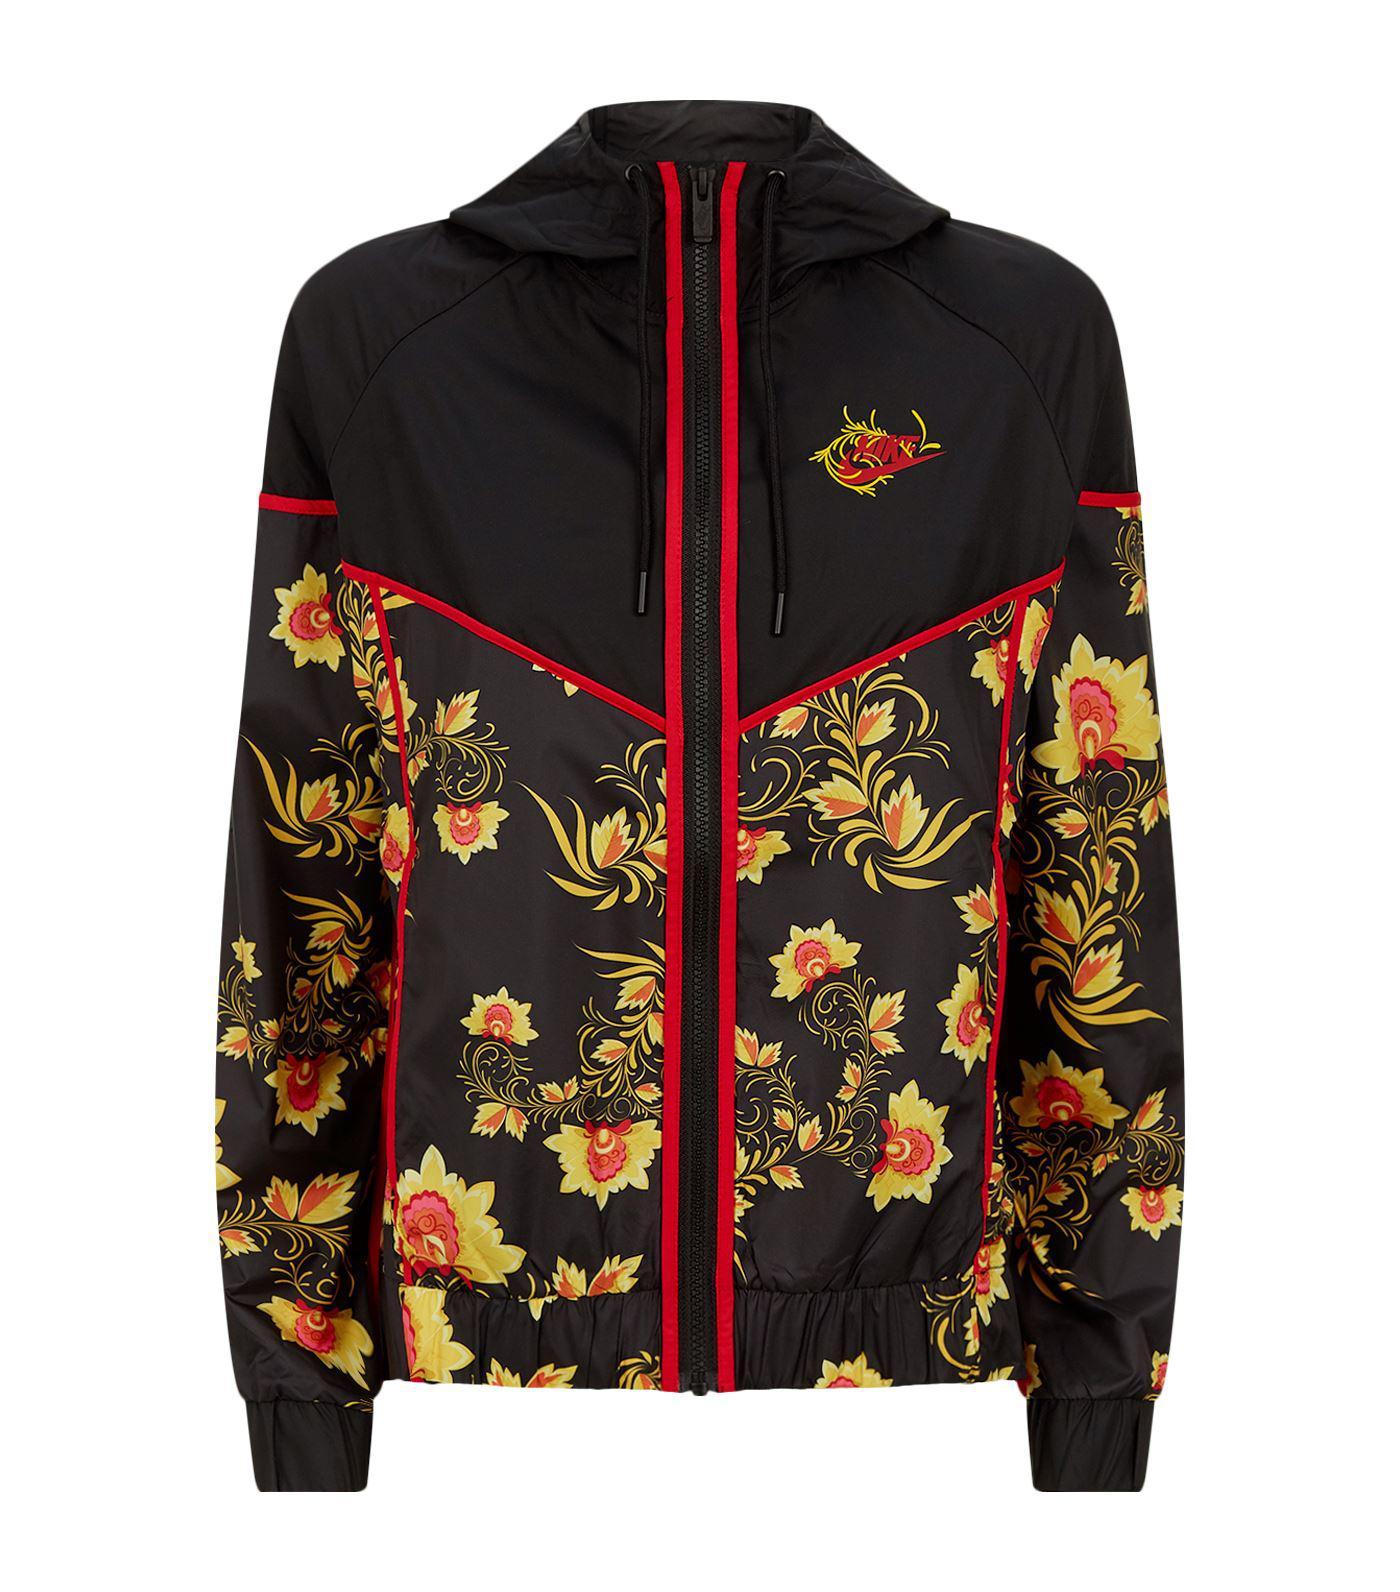 3f888ec3c7 Nike Russian Floral Track Jacket in Black - Lyst